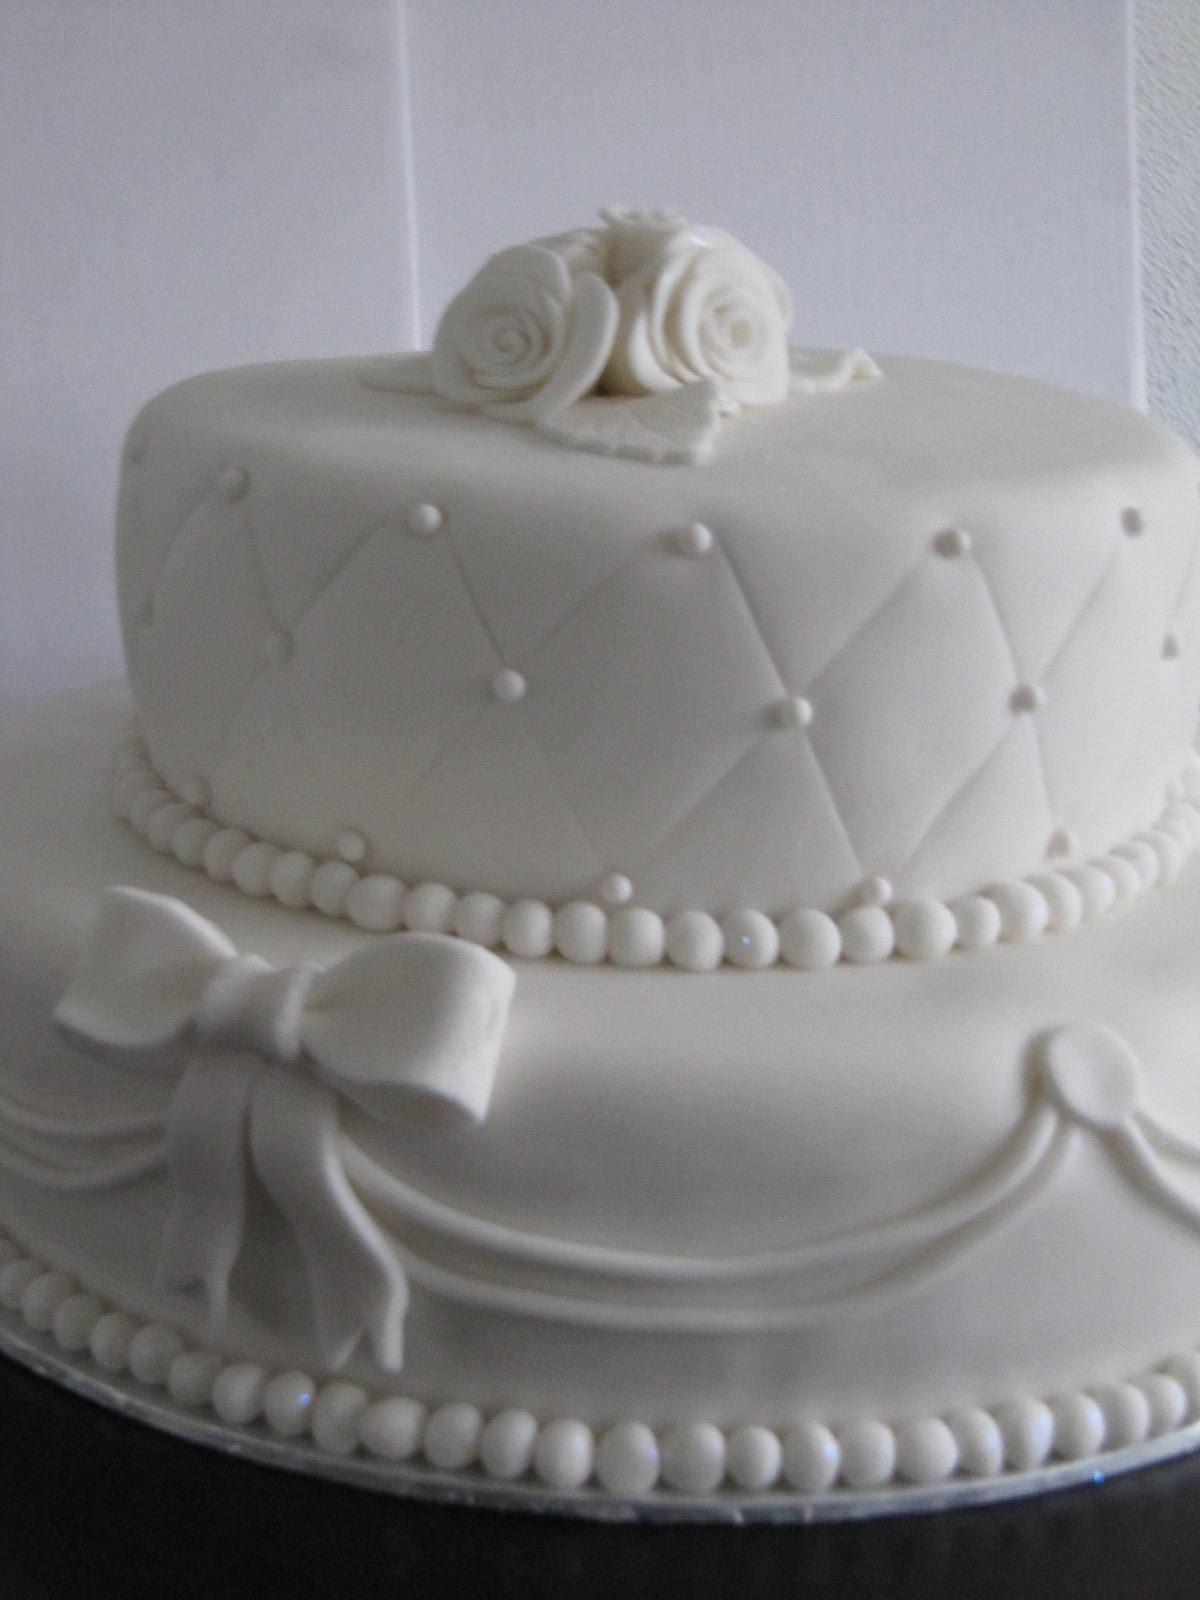 25 jarig huwelijk taart 50 Jarig Huwelijk Taart   ARCHIDEV 25 jarig huwelijk taart